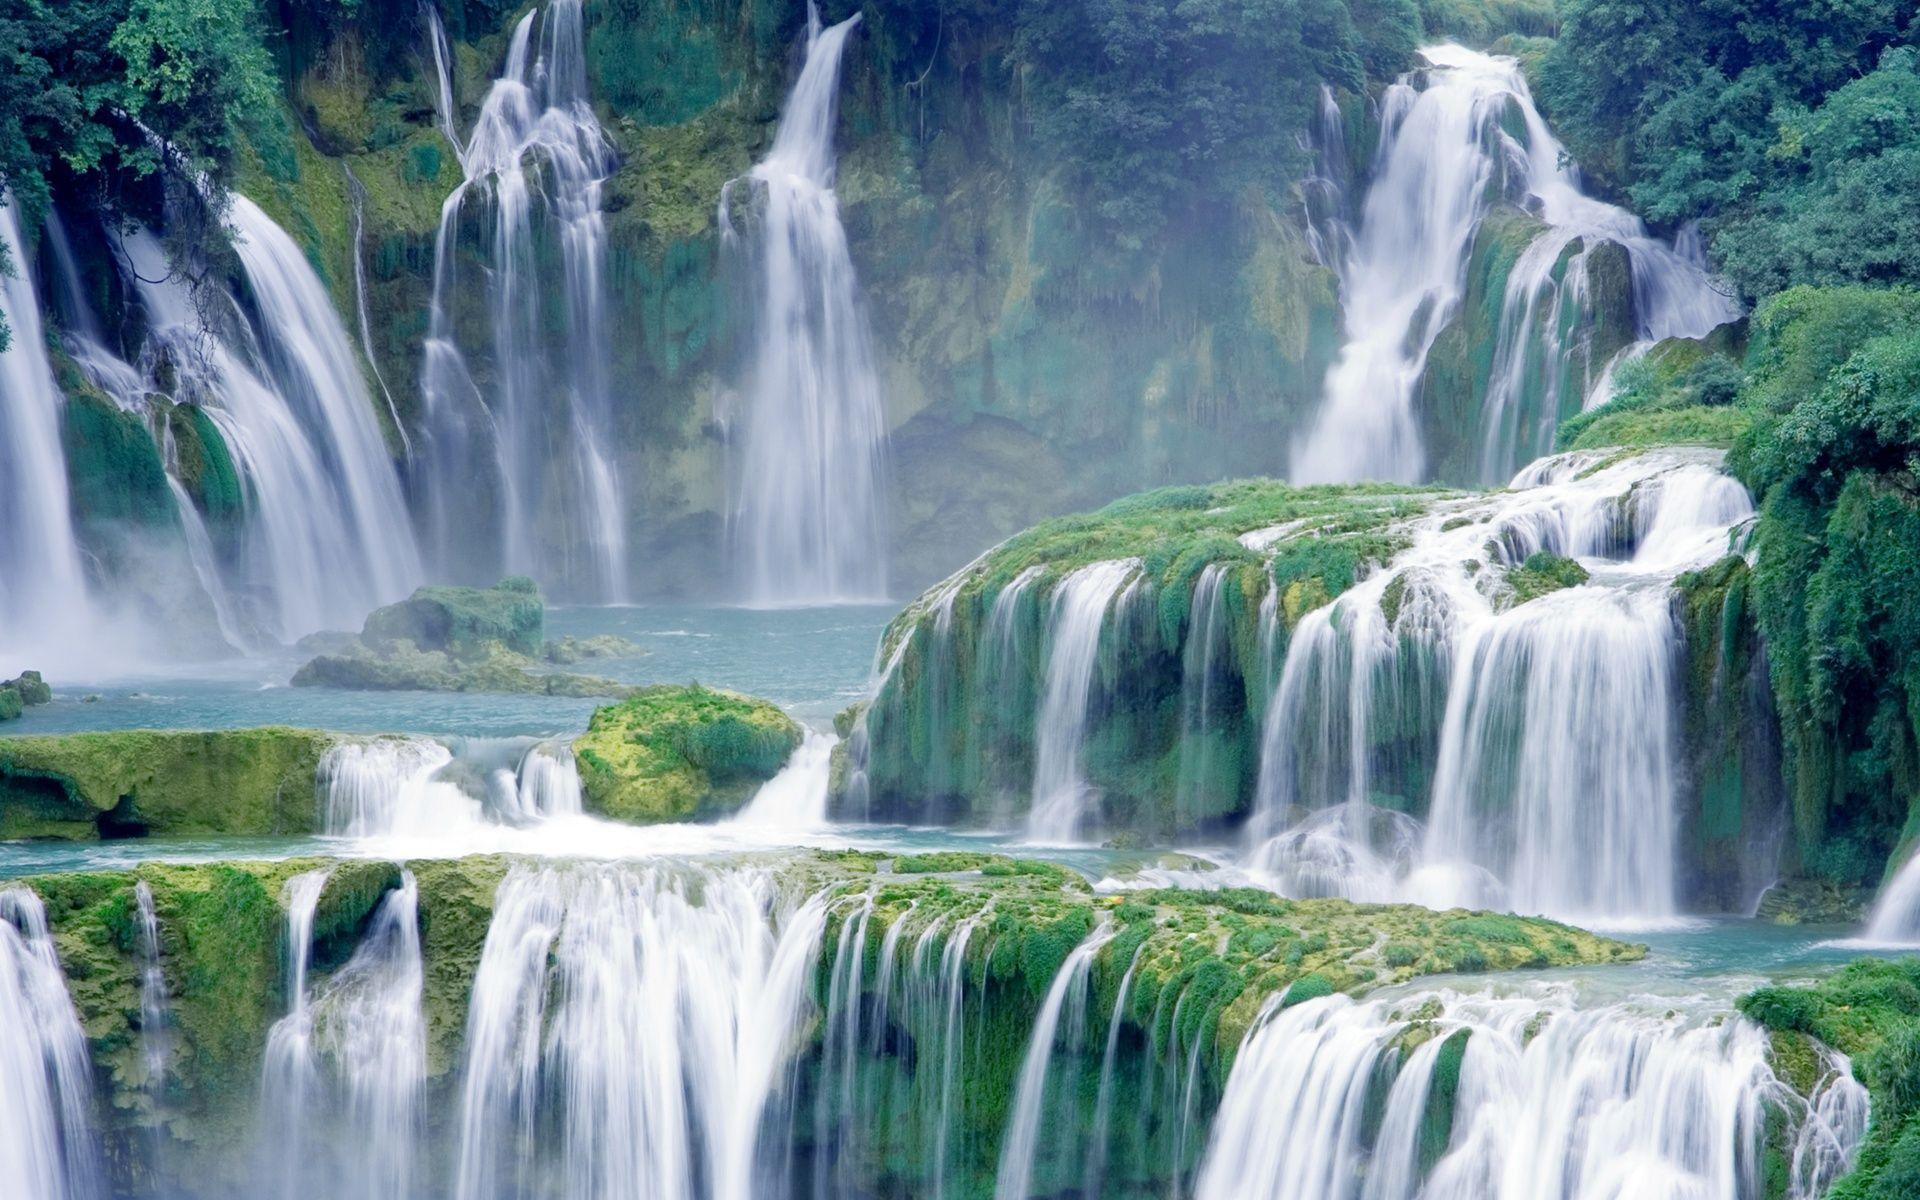 Wallpapers Waterfall Wallpaper wallpapers Pinterest